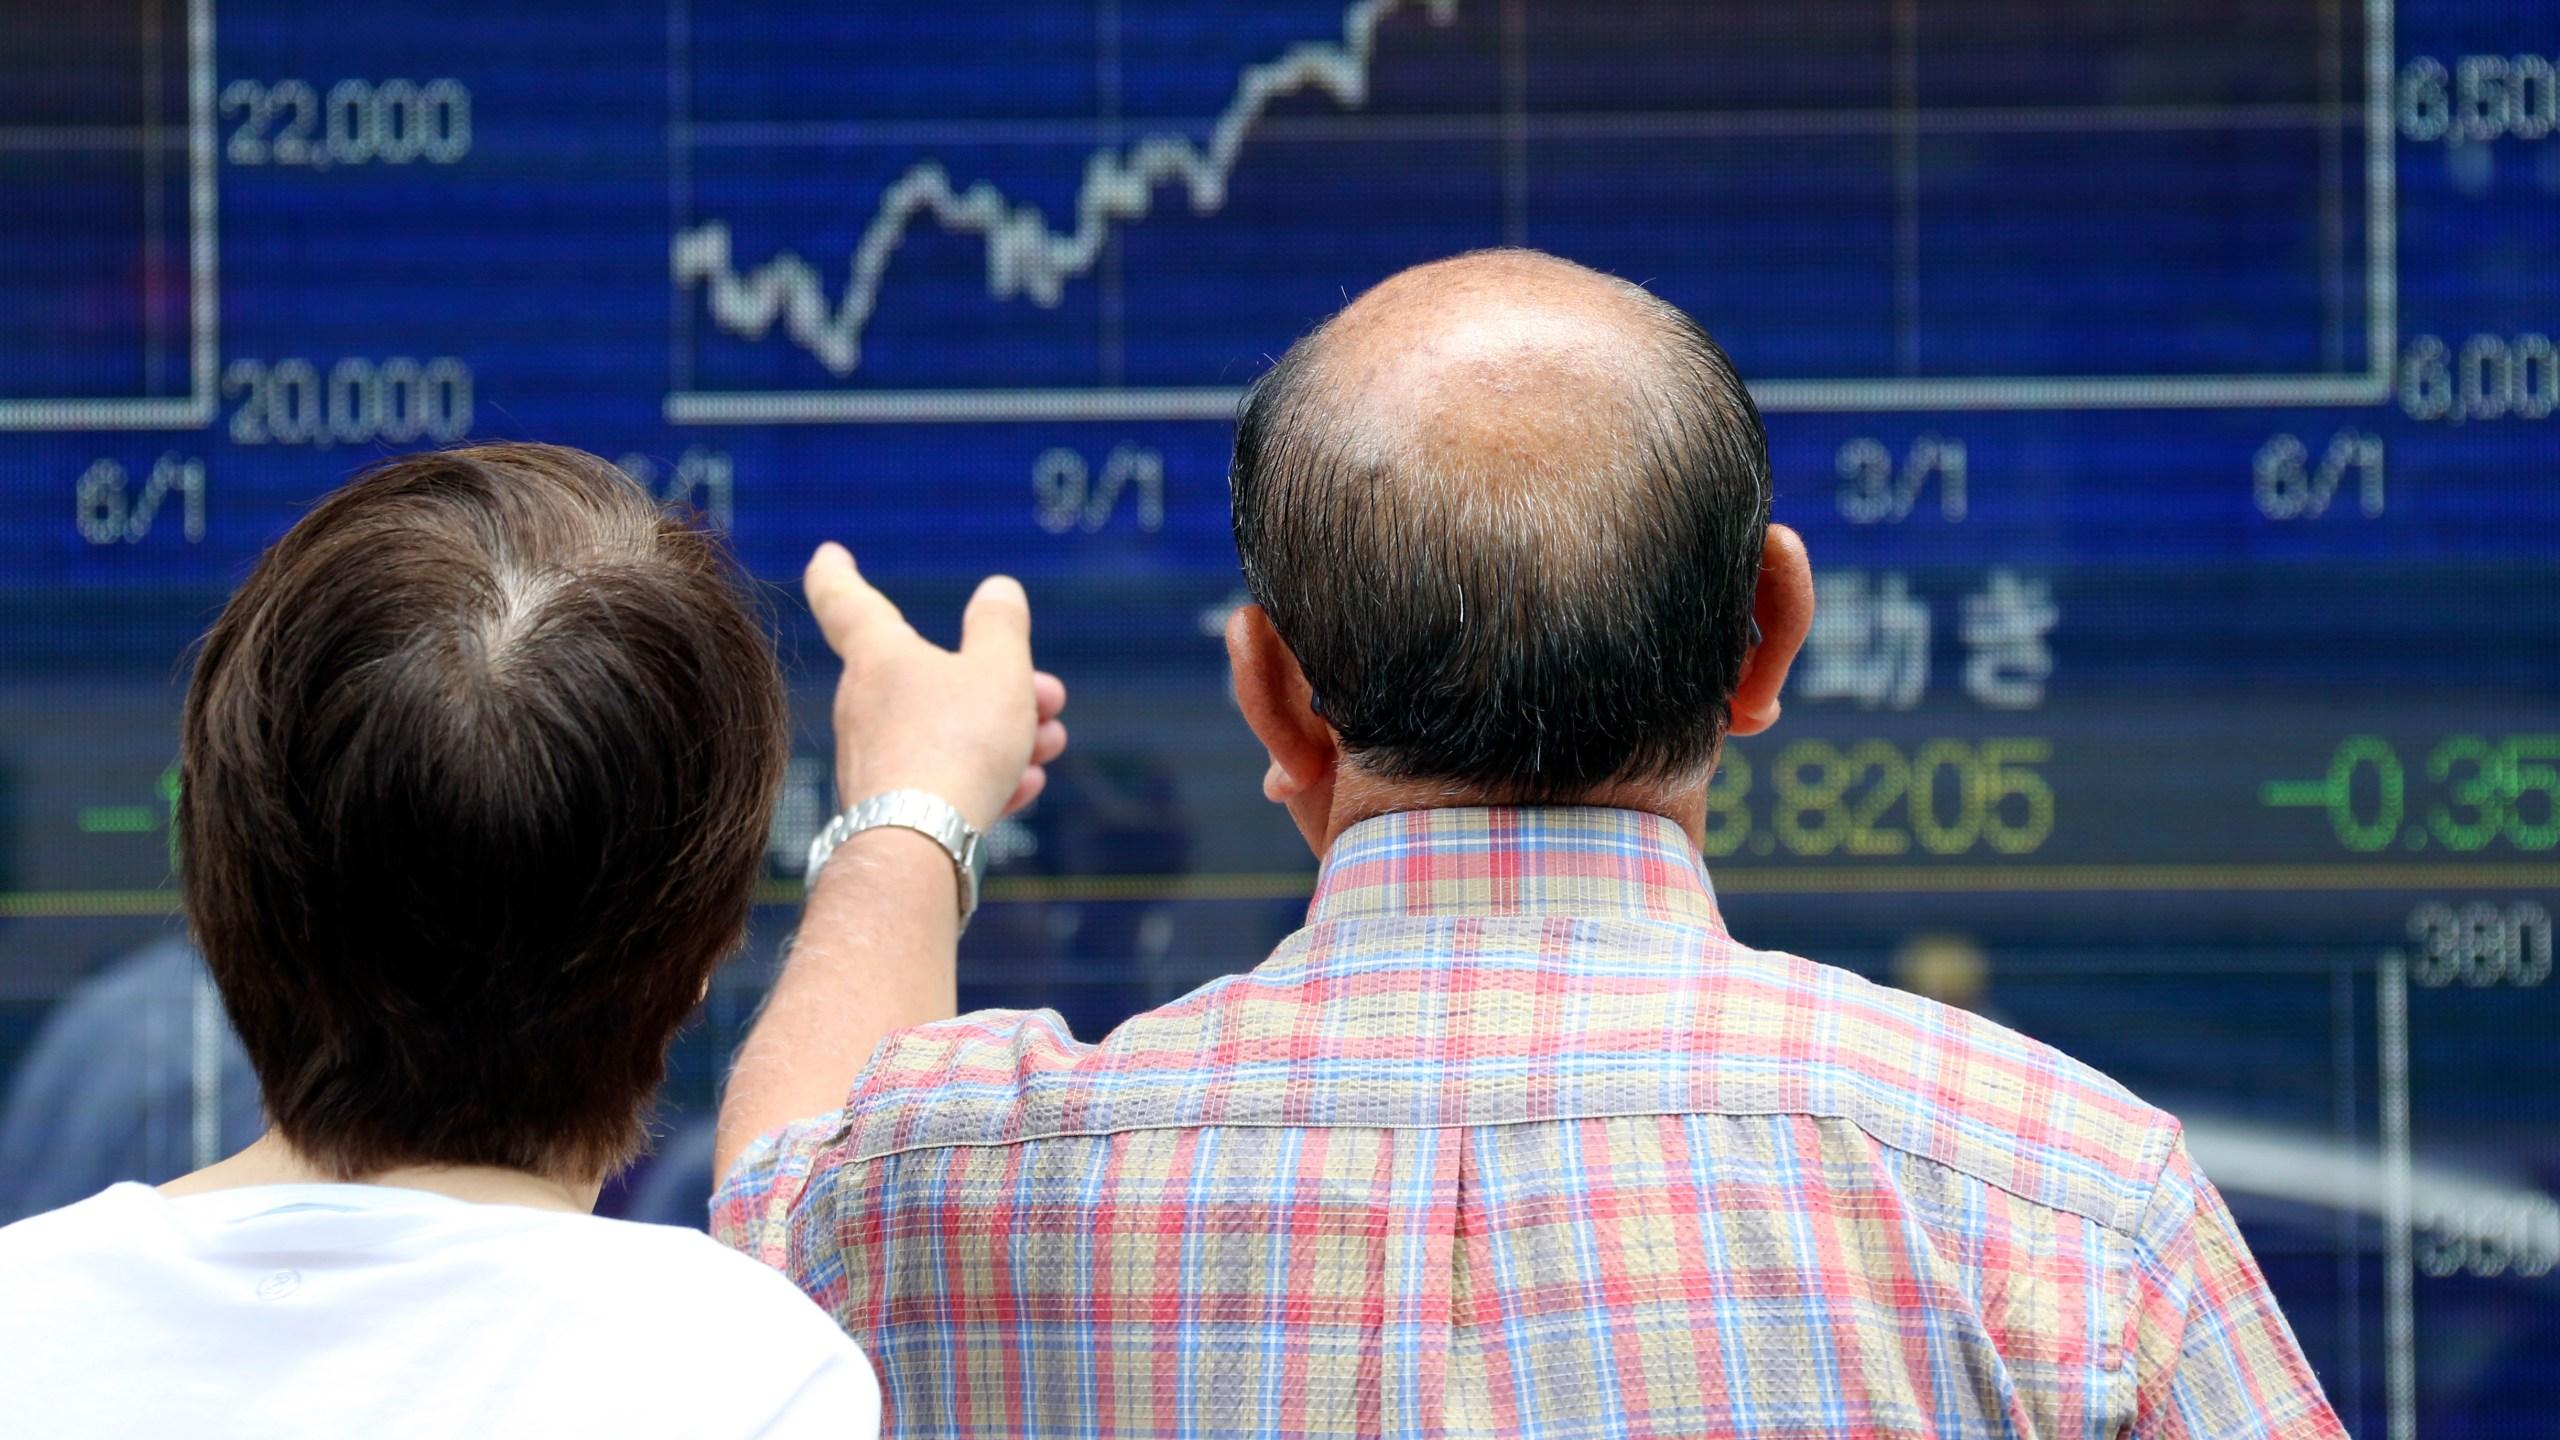 Japan_Financial_Markets_23516-159532.jpg66659877